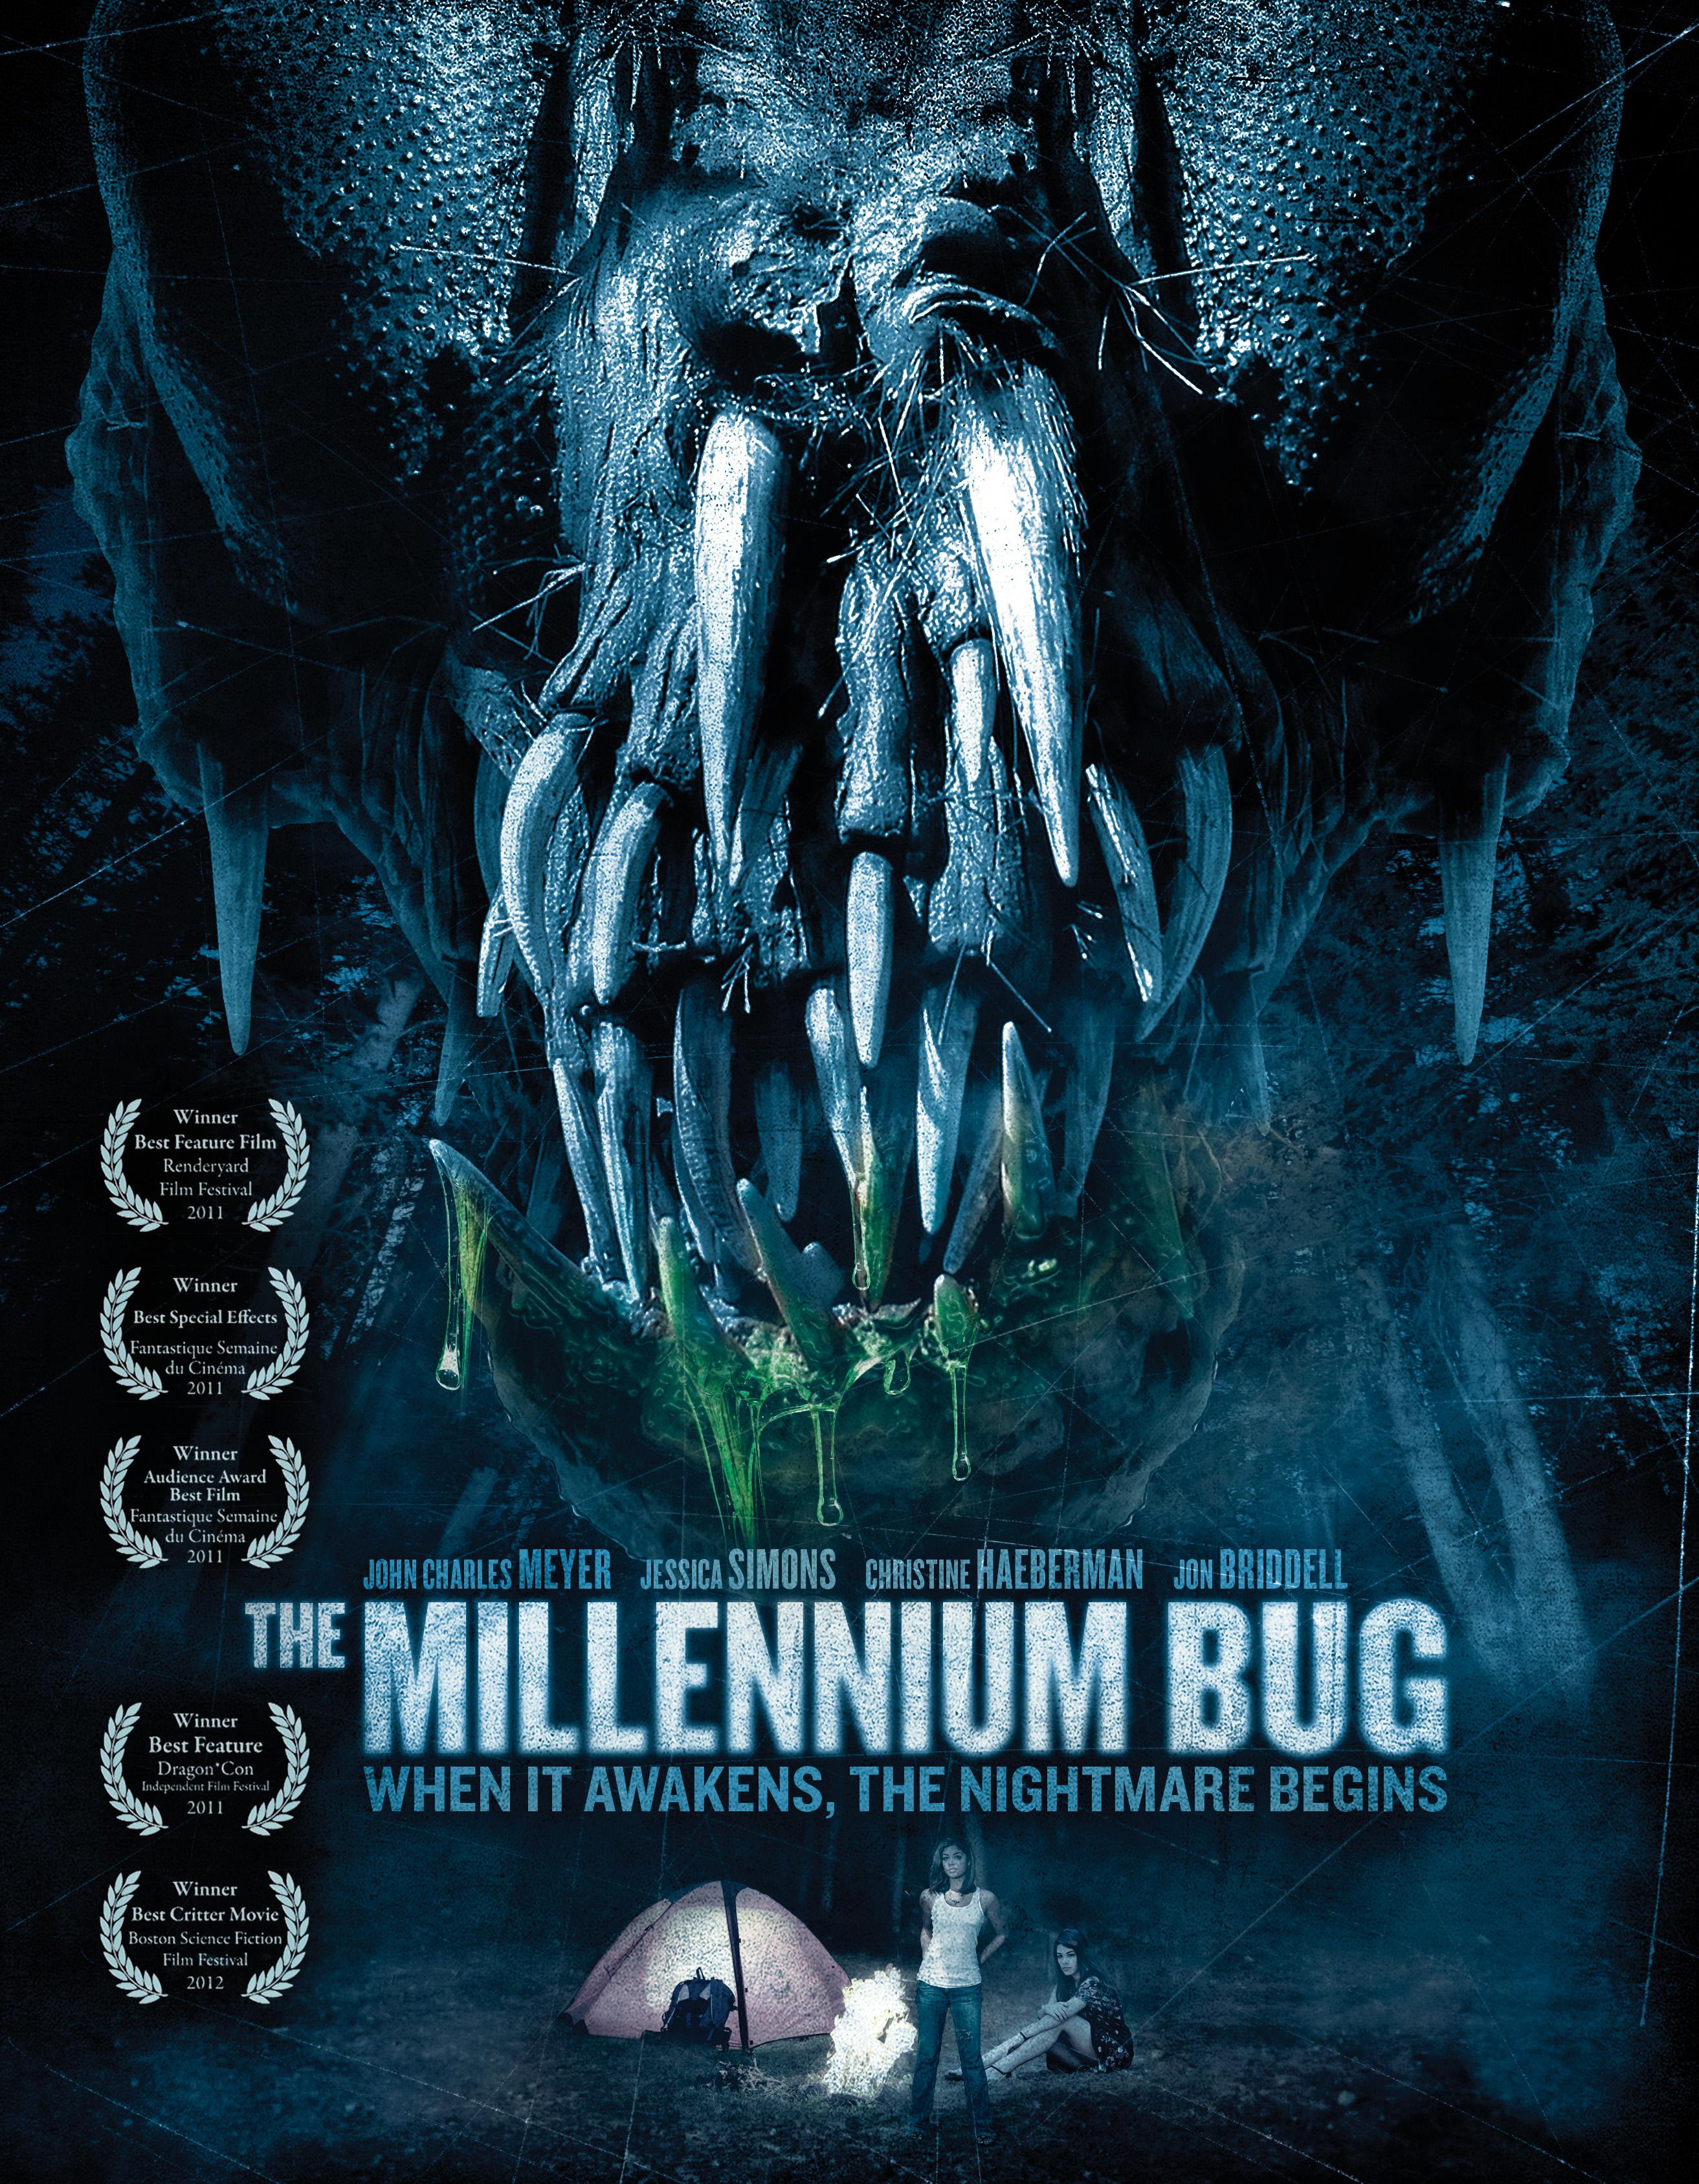 The Millennium Bug